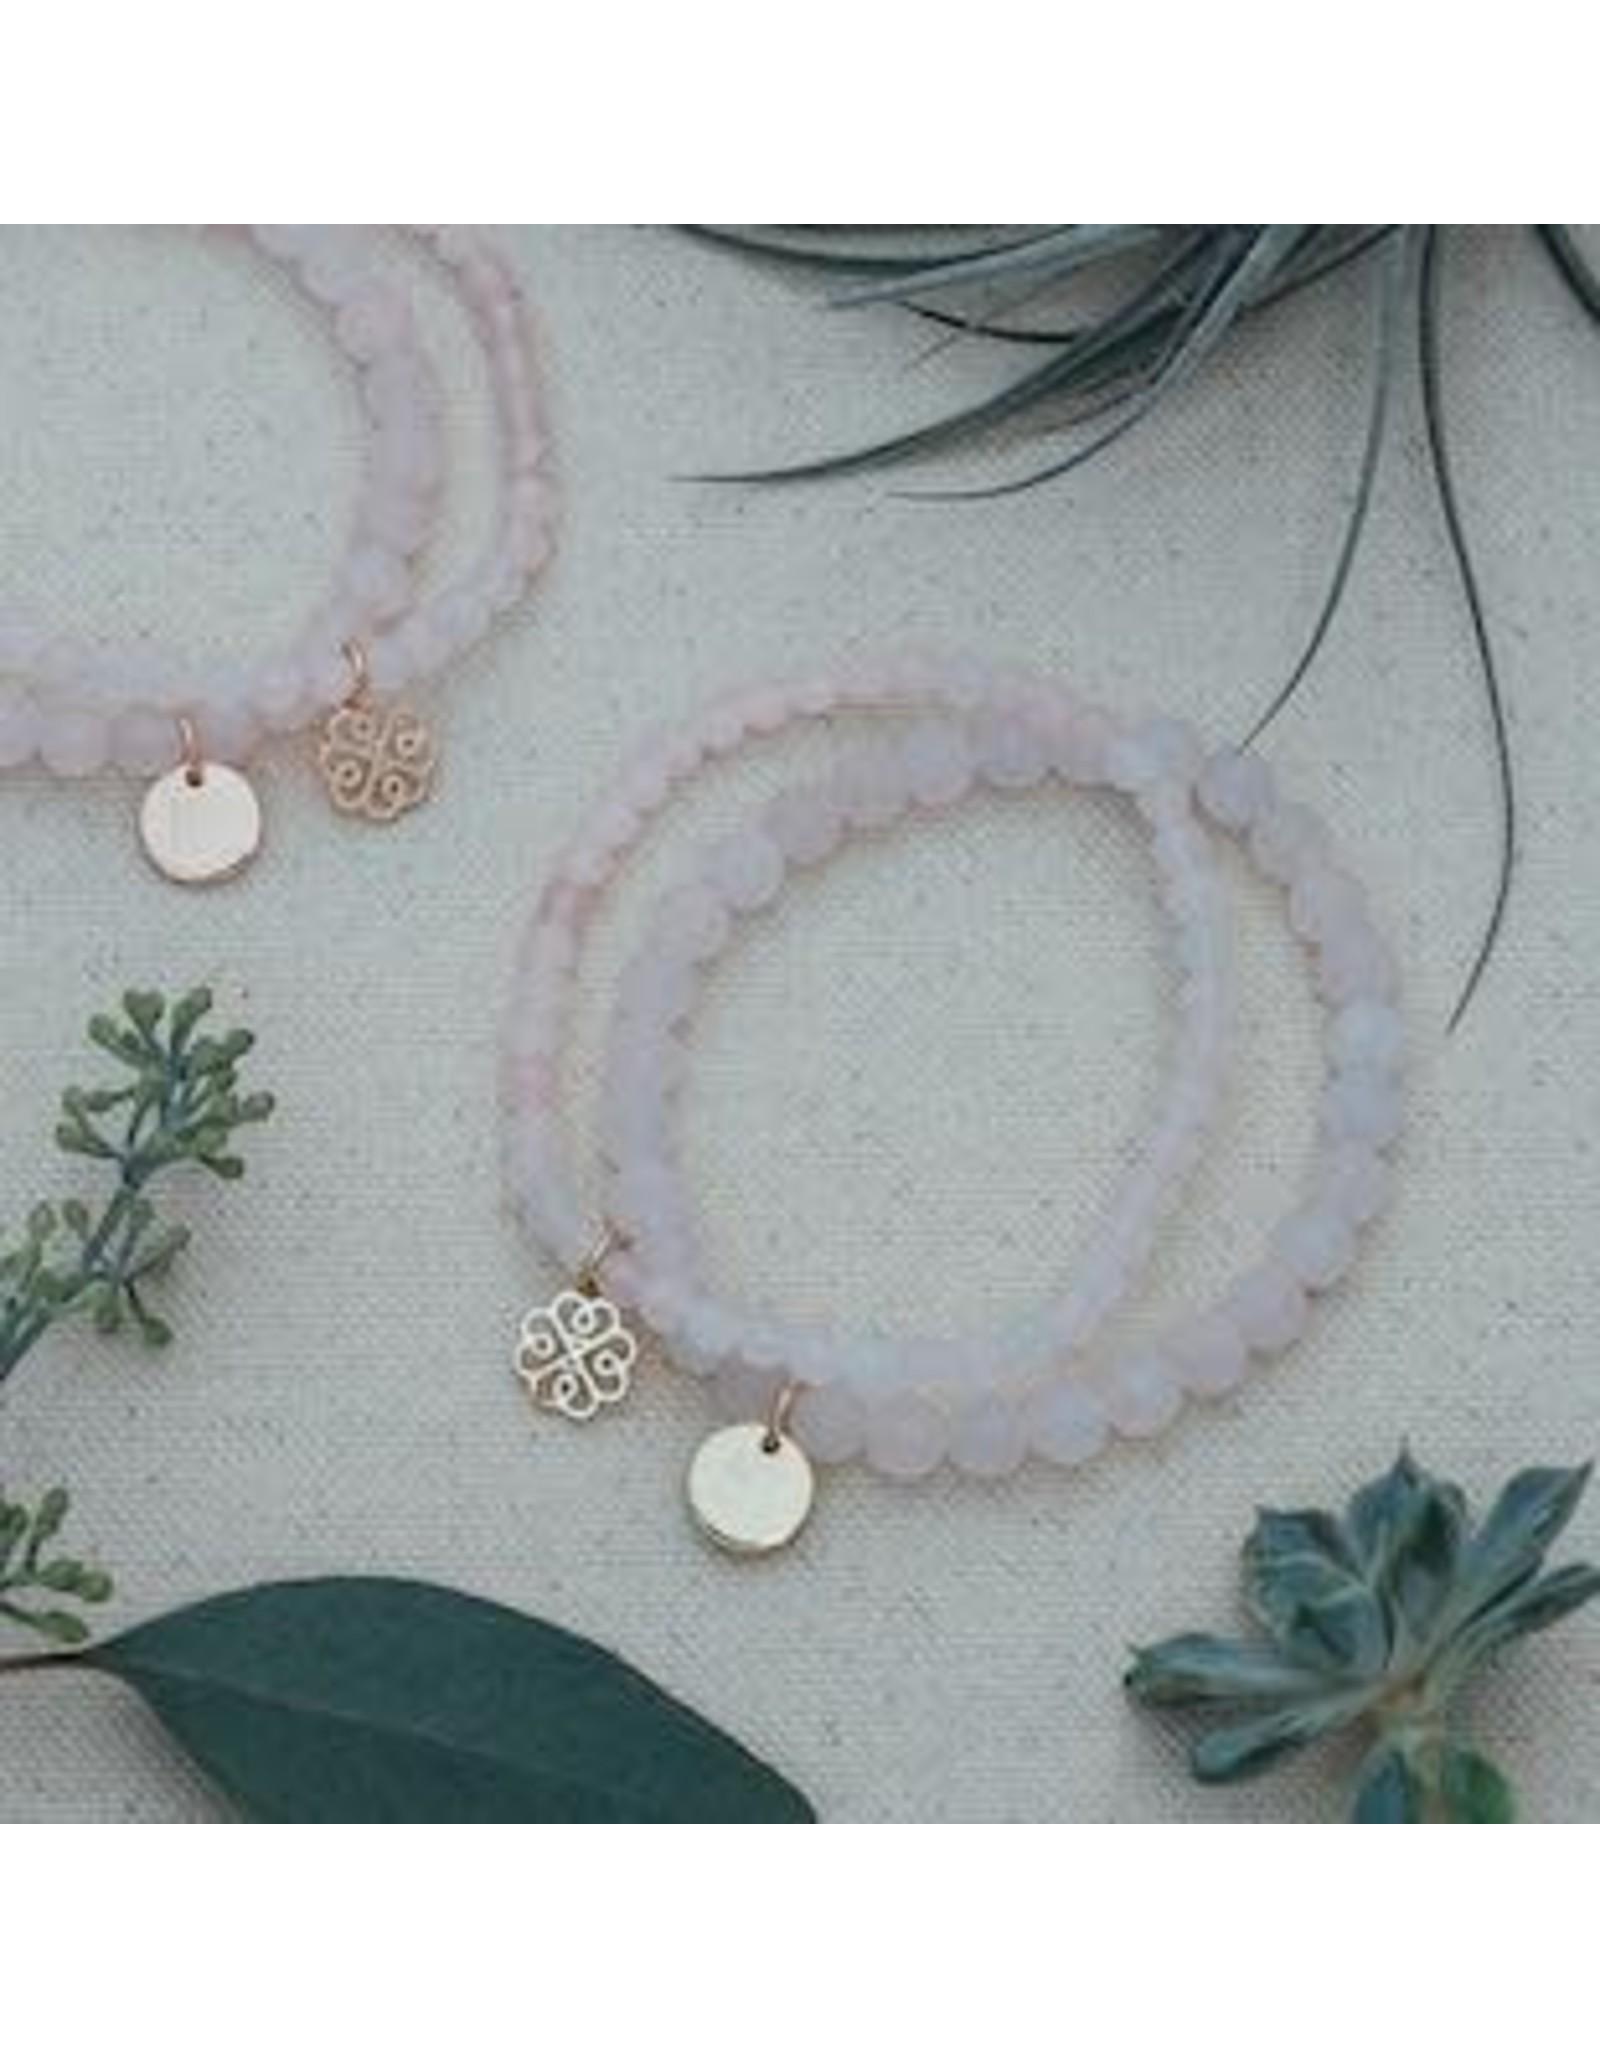 Glee jewelry Stackem Up Bracelets, Gold/Rose Quartz